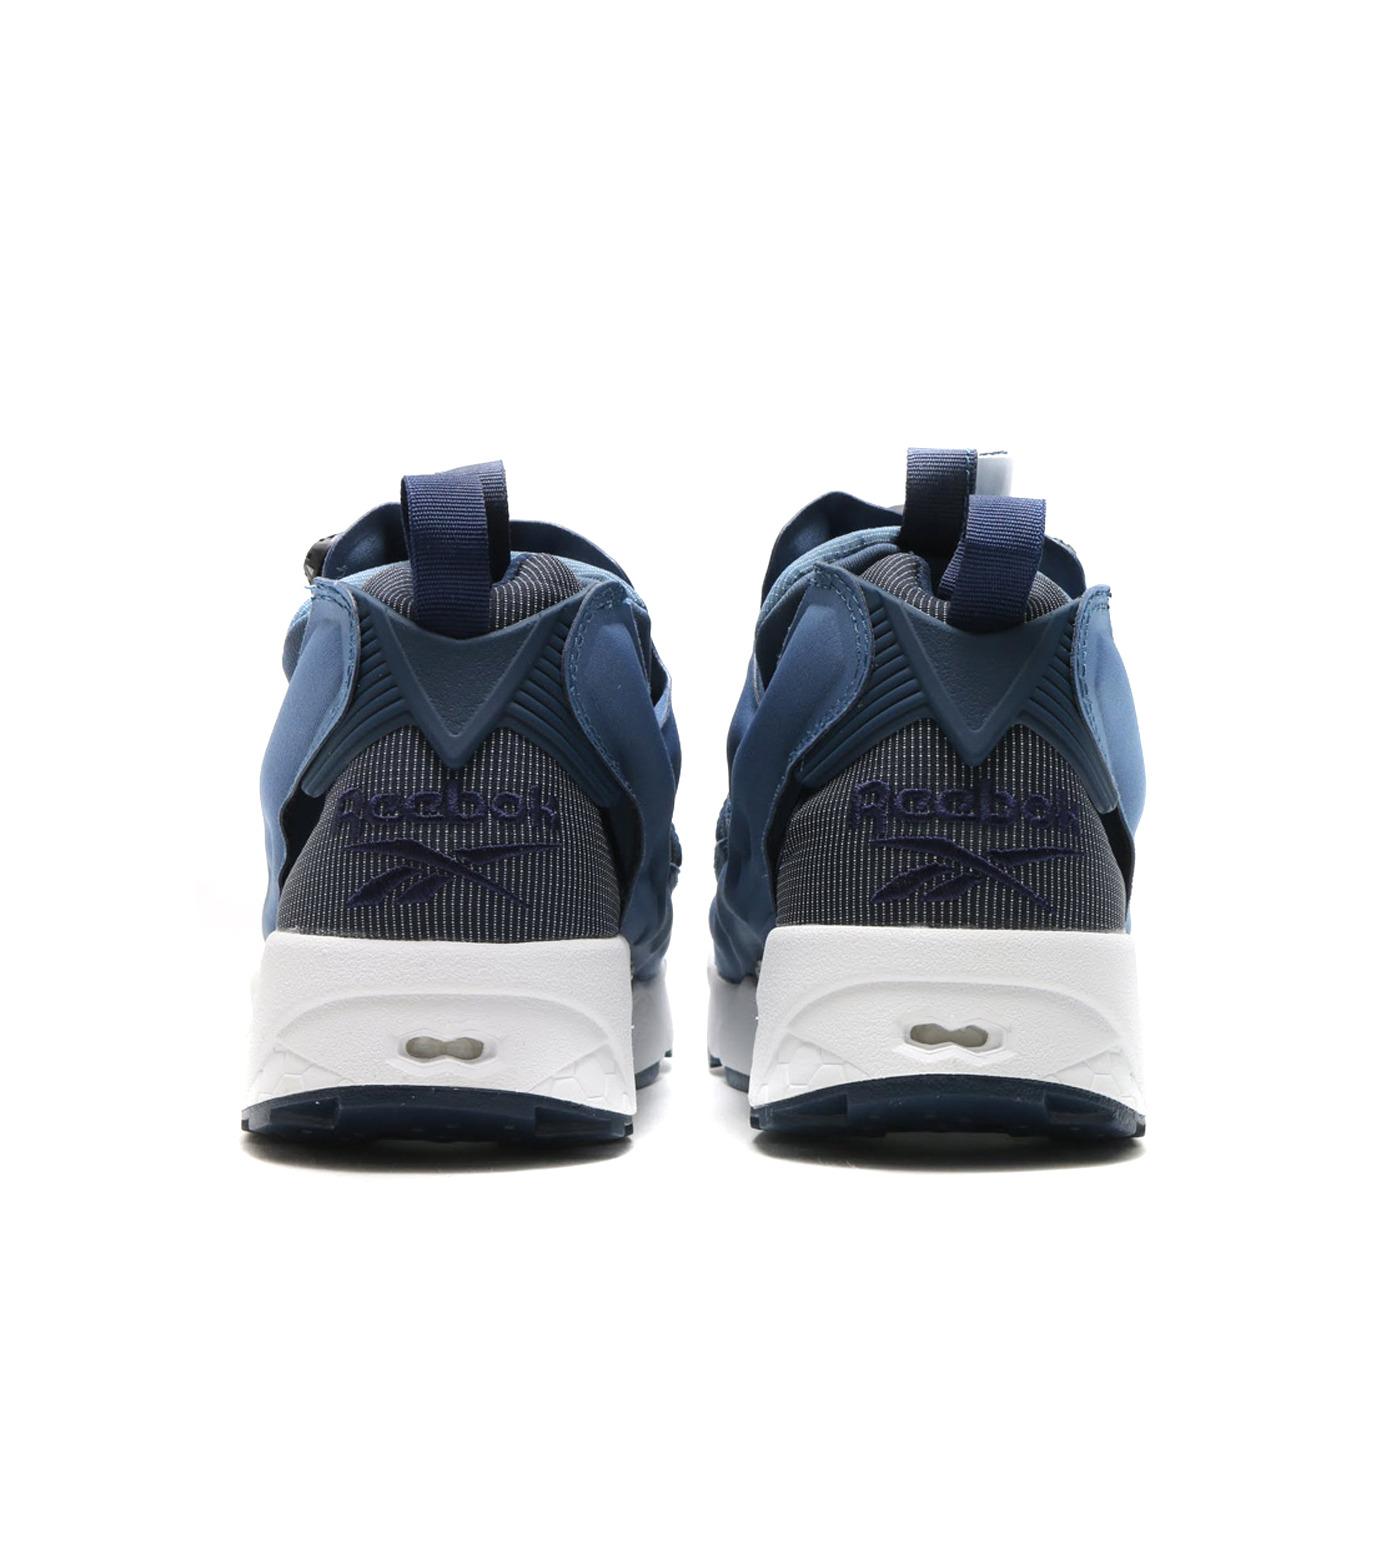 Reebok(リーボック)のINSTAPUMP FURY TECH-NAVY(シューズ/shoes)-AR0624-93 拡大詳細画像4